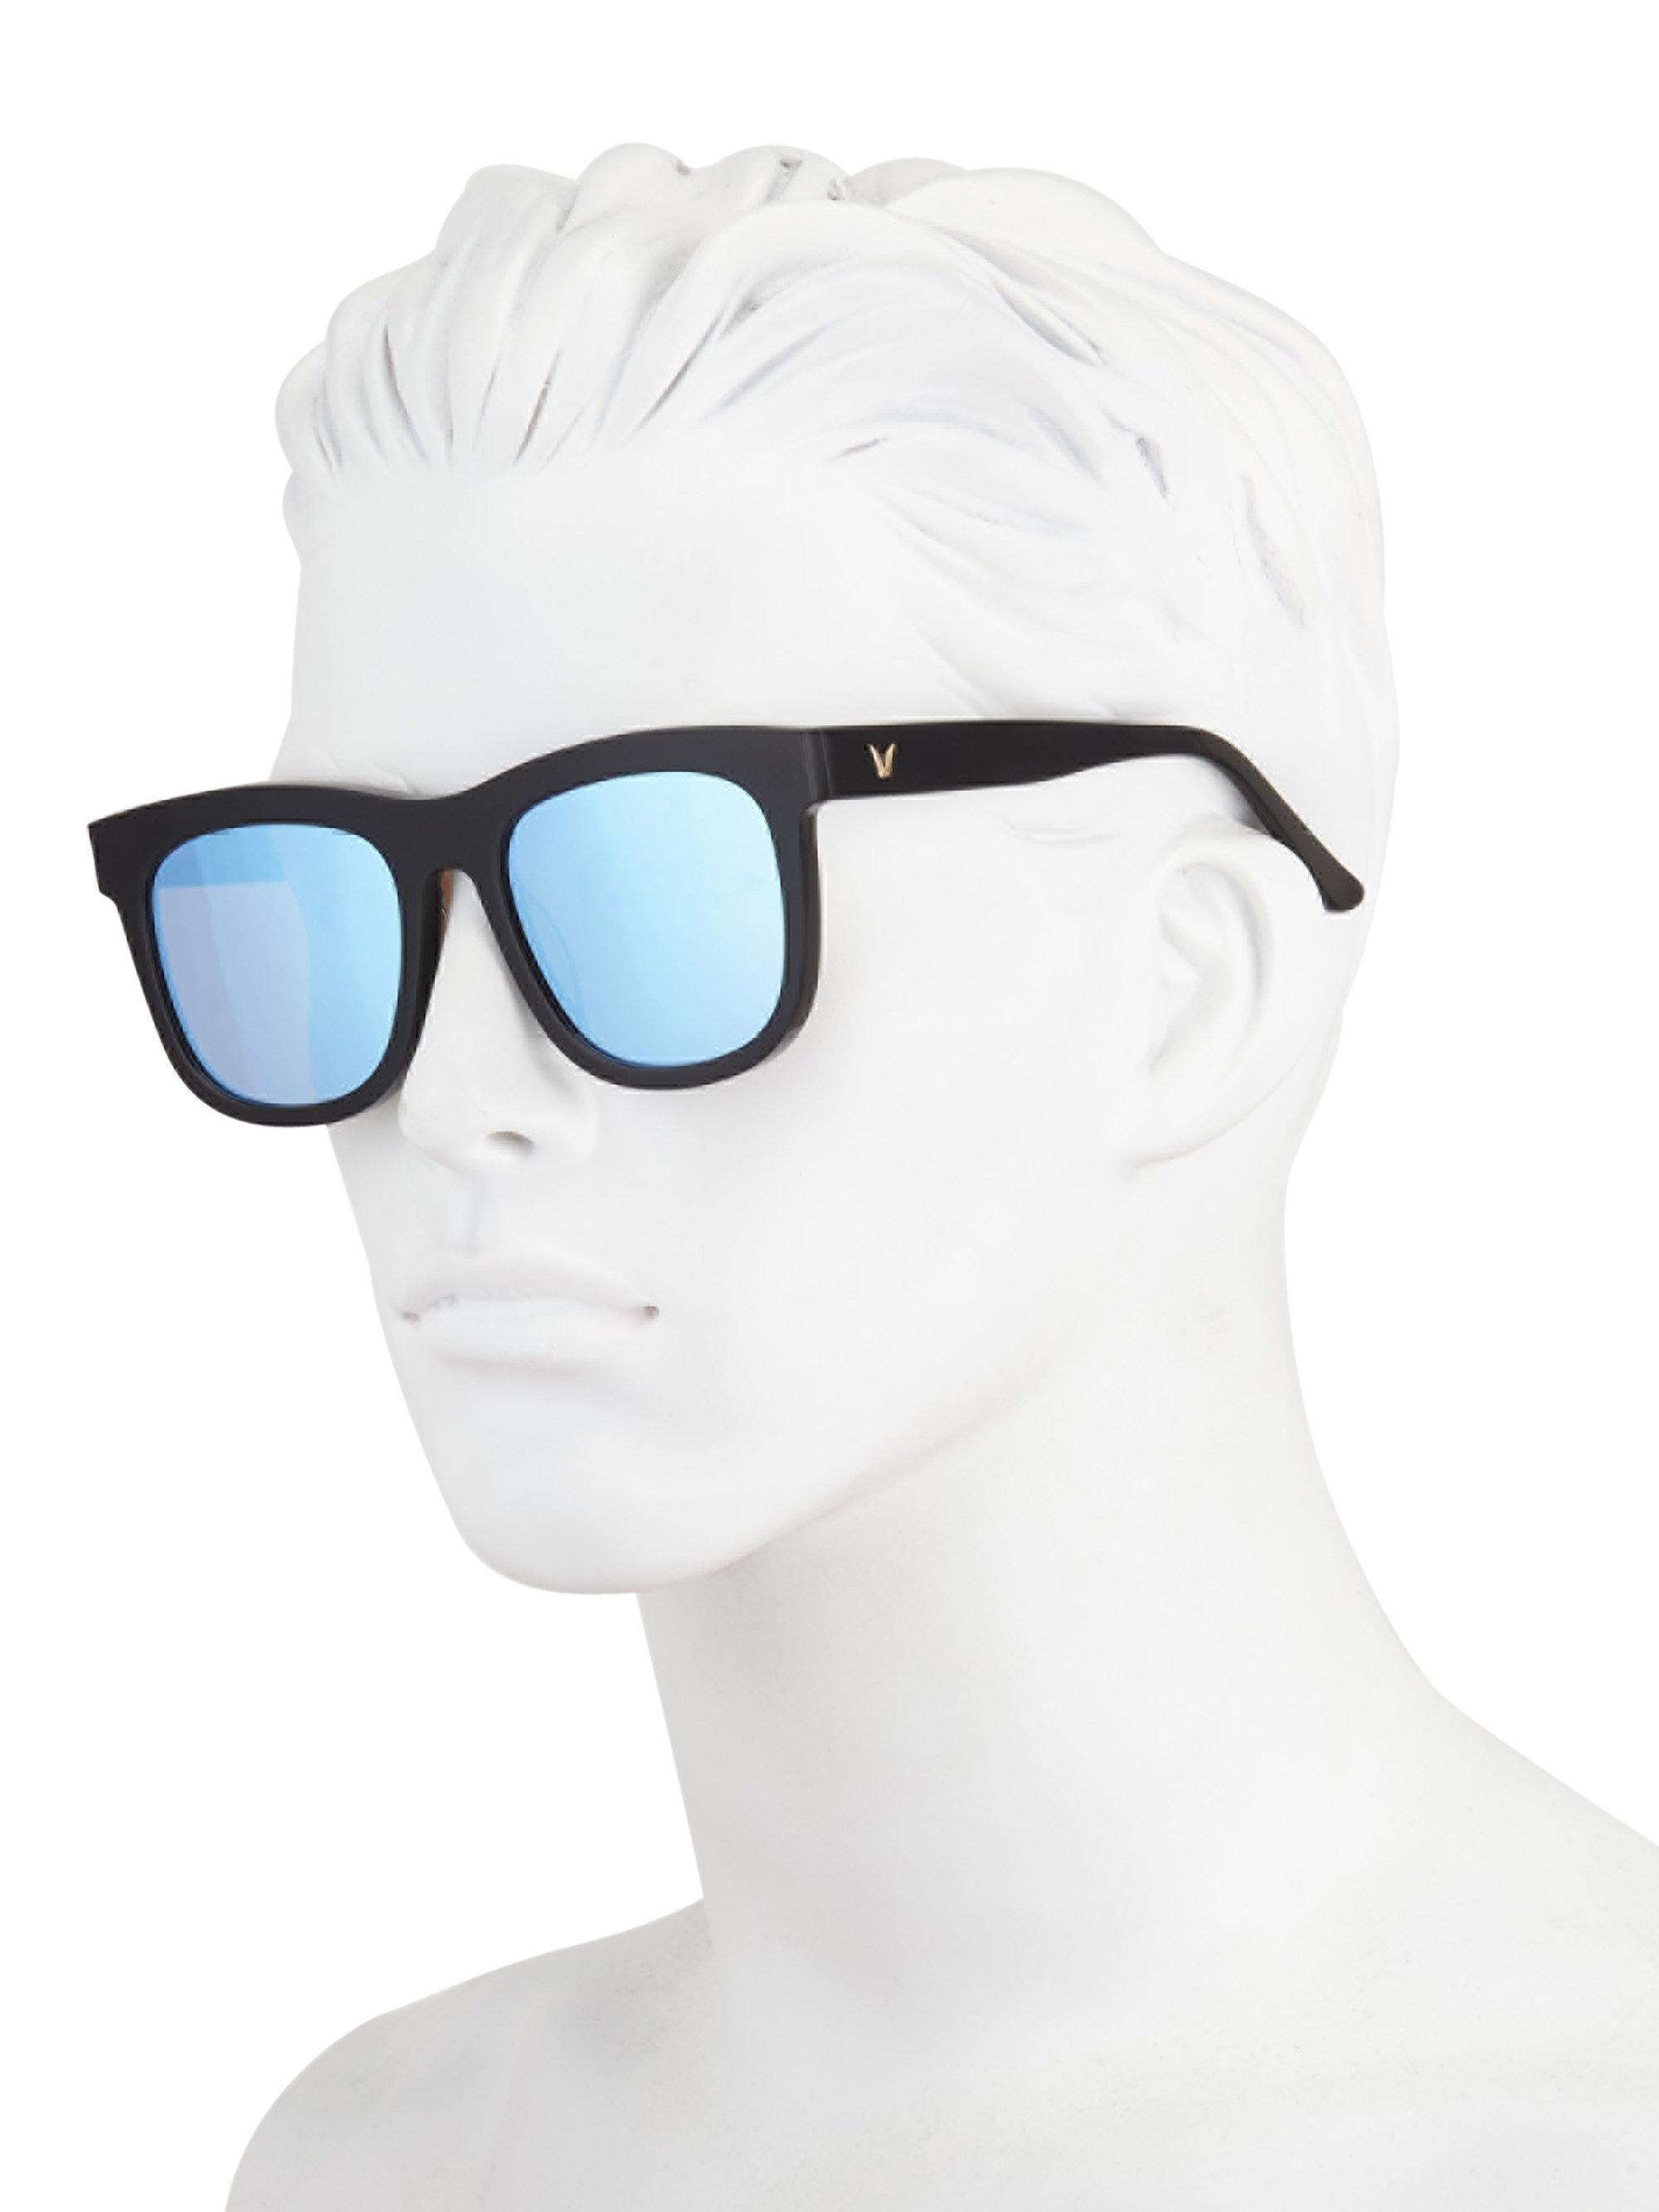 1cdcd16bbd7 Lyst - Gentle Monster Pulp Fiction 53 Mm Wayfarer Sunglasses in ...